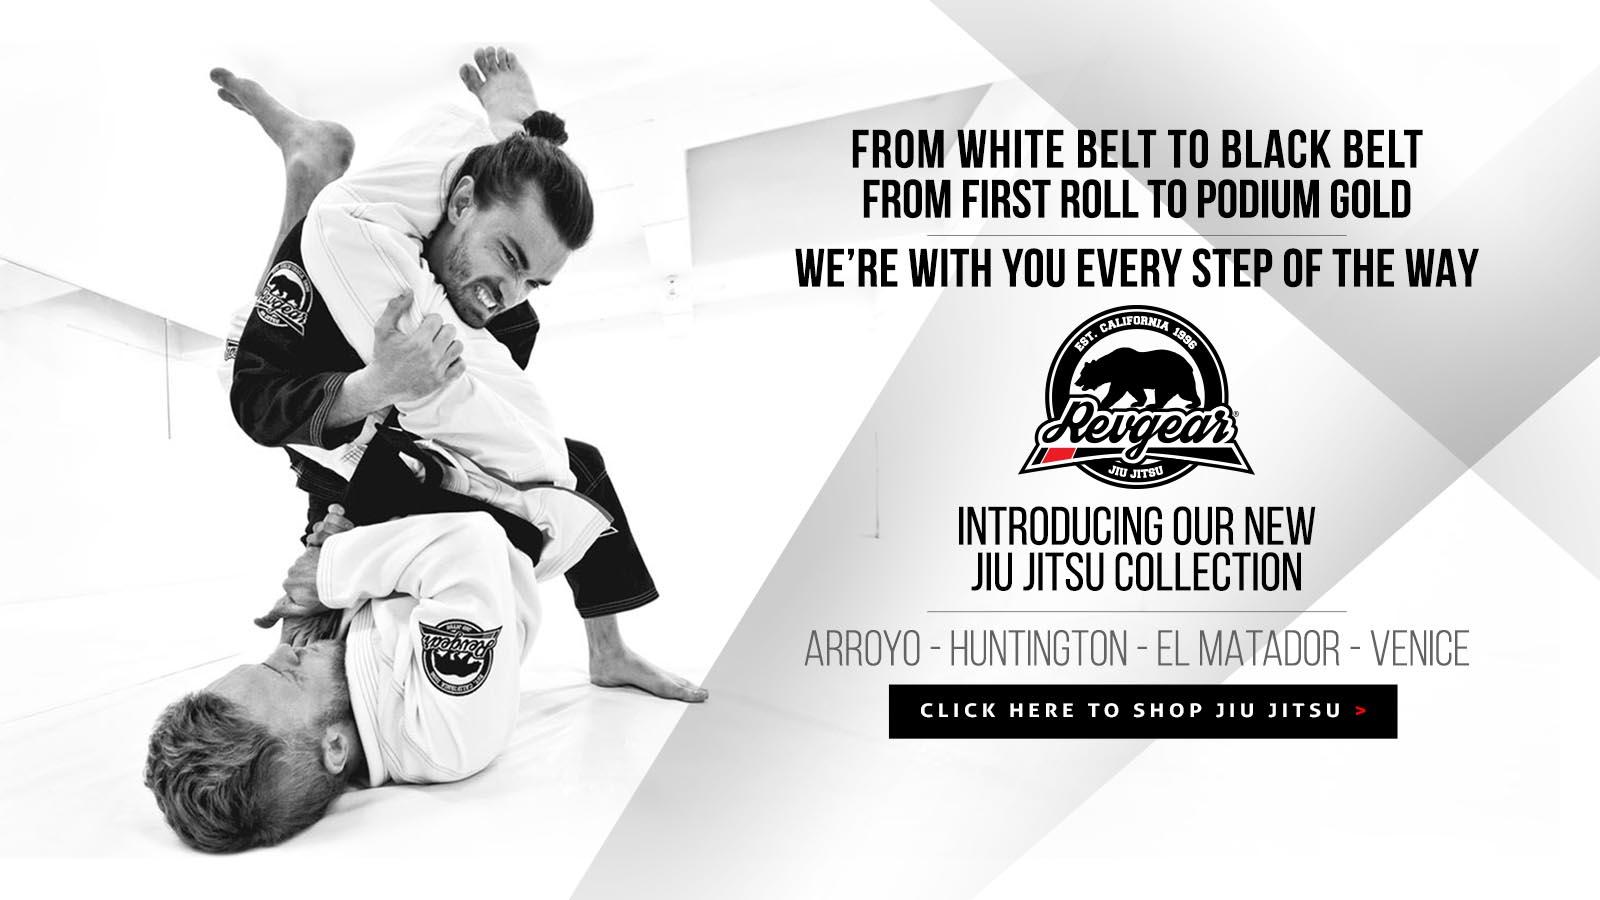 Martial Arts Supplies   MMA Gear   Boxing Gear   Revgear